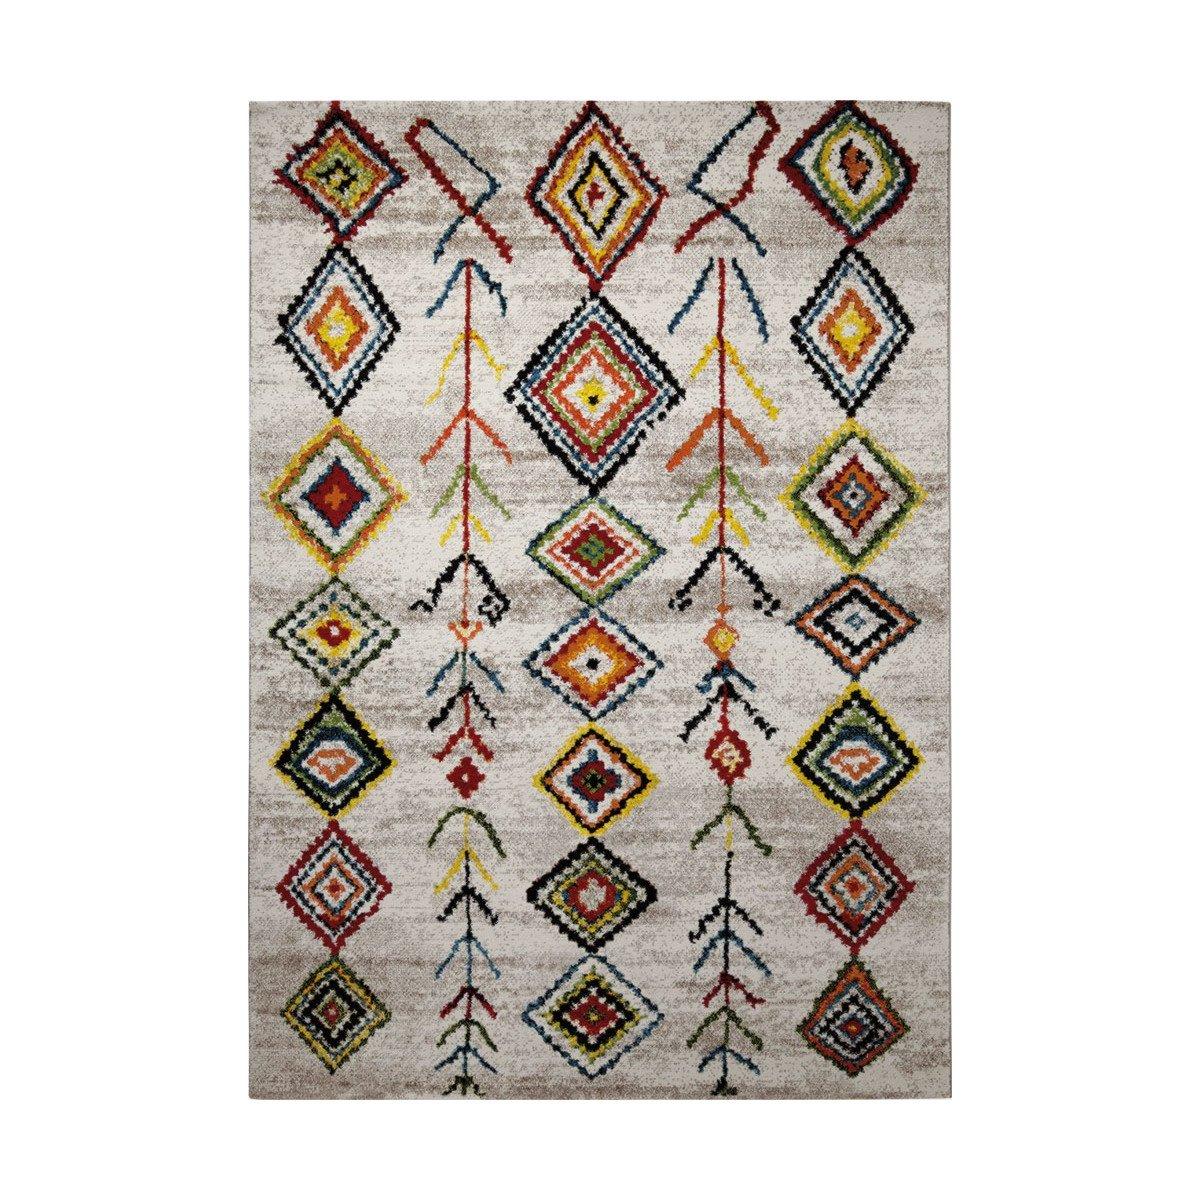 Tapis inspiration berbère multicolore pour salon ou chambre 80x150